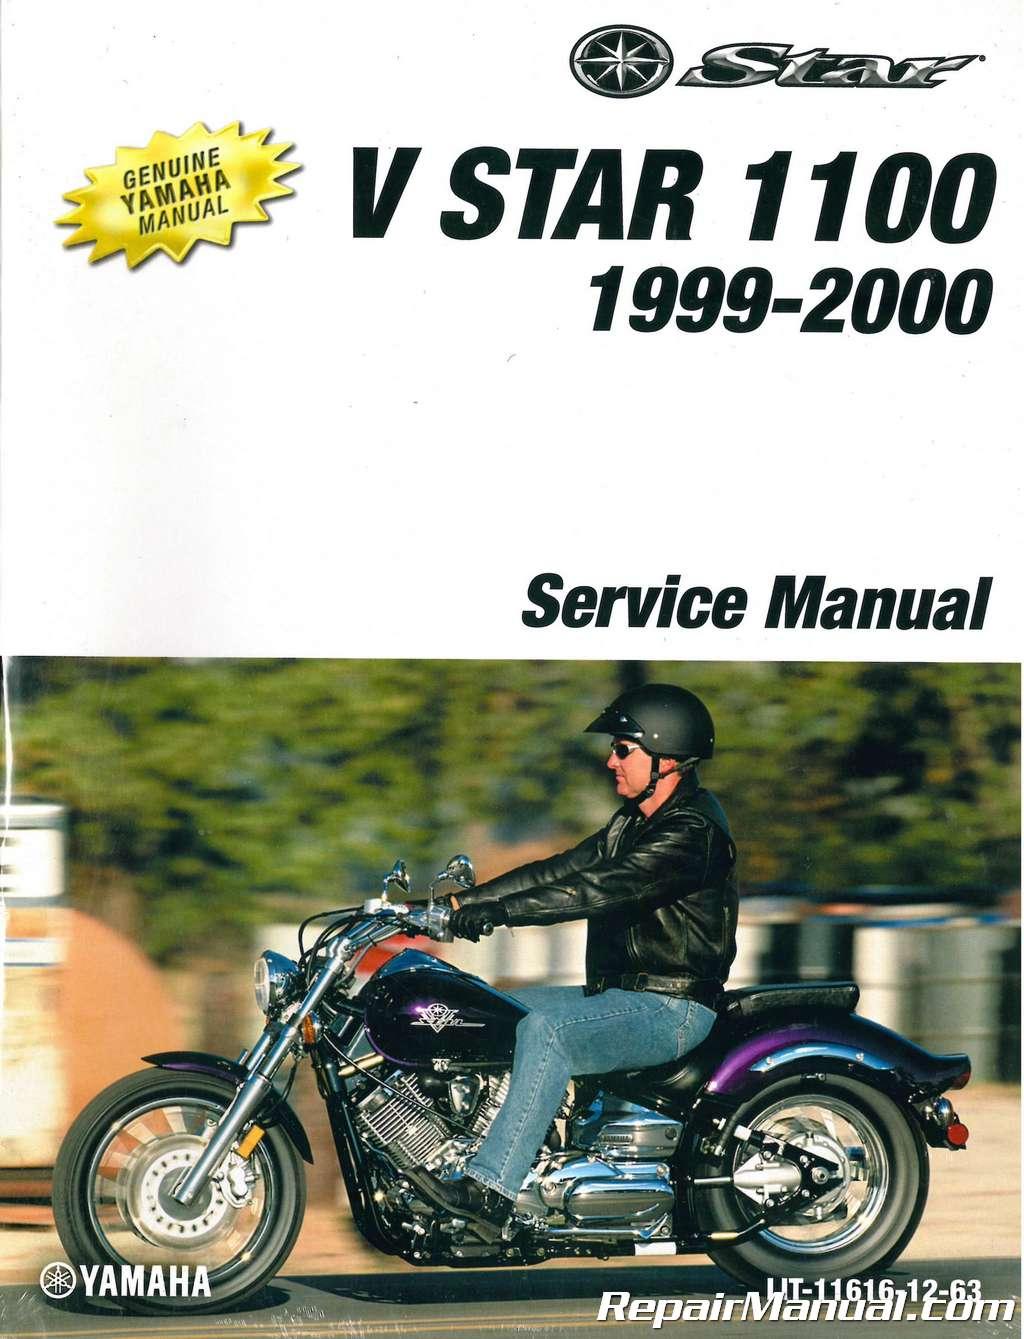 hight resolution of wrg 1822 1999 v star 1100 wiring diagram1999 v star 1100 wiring diagram